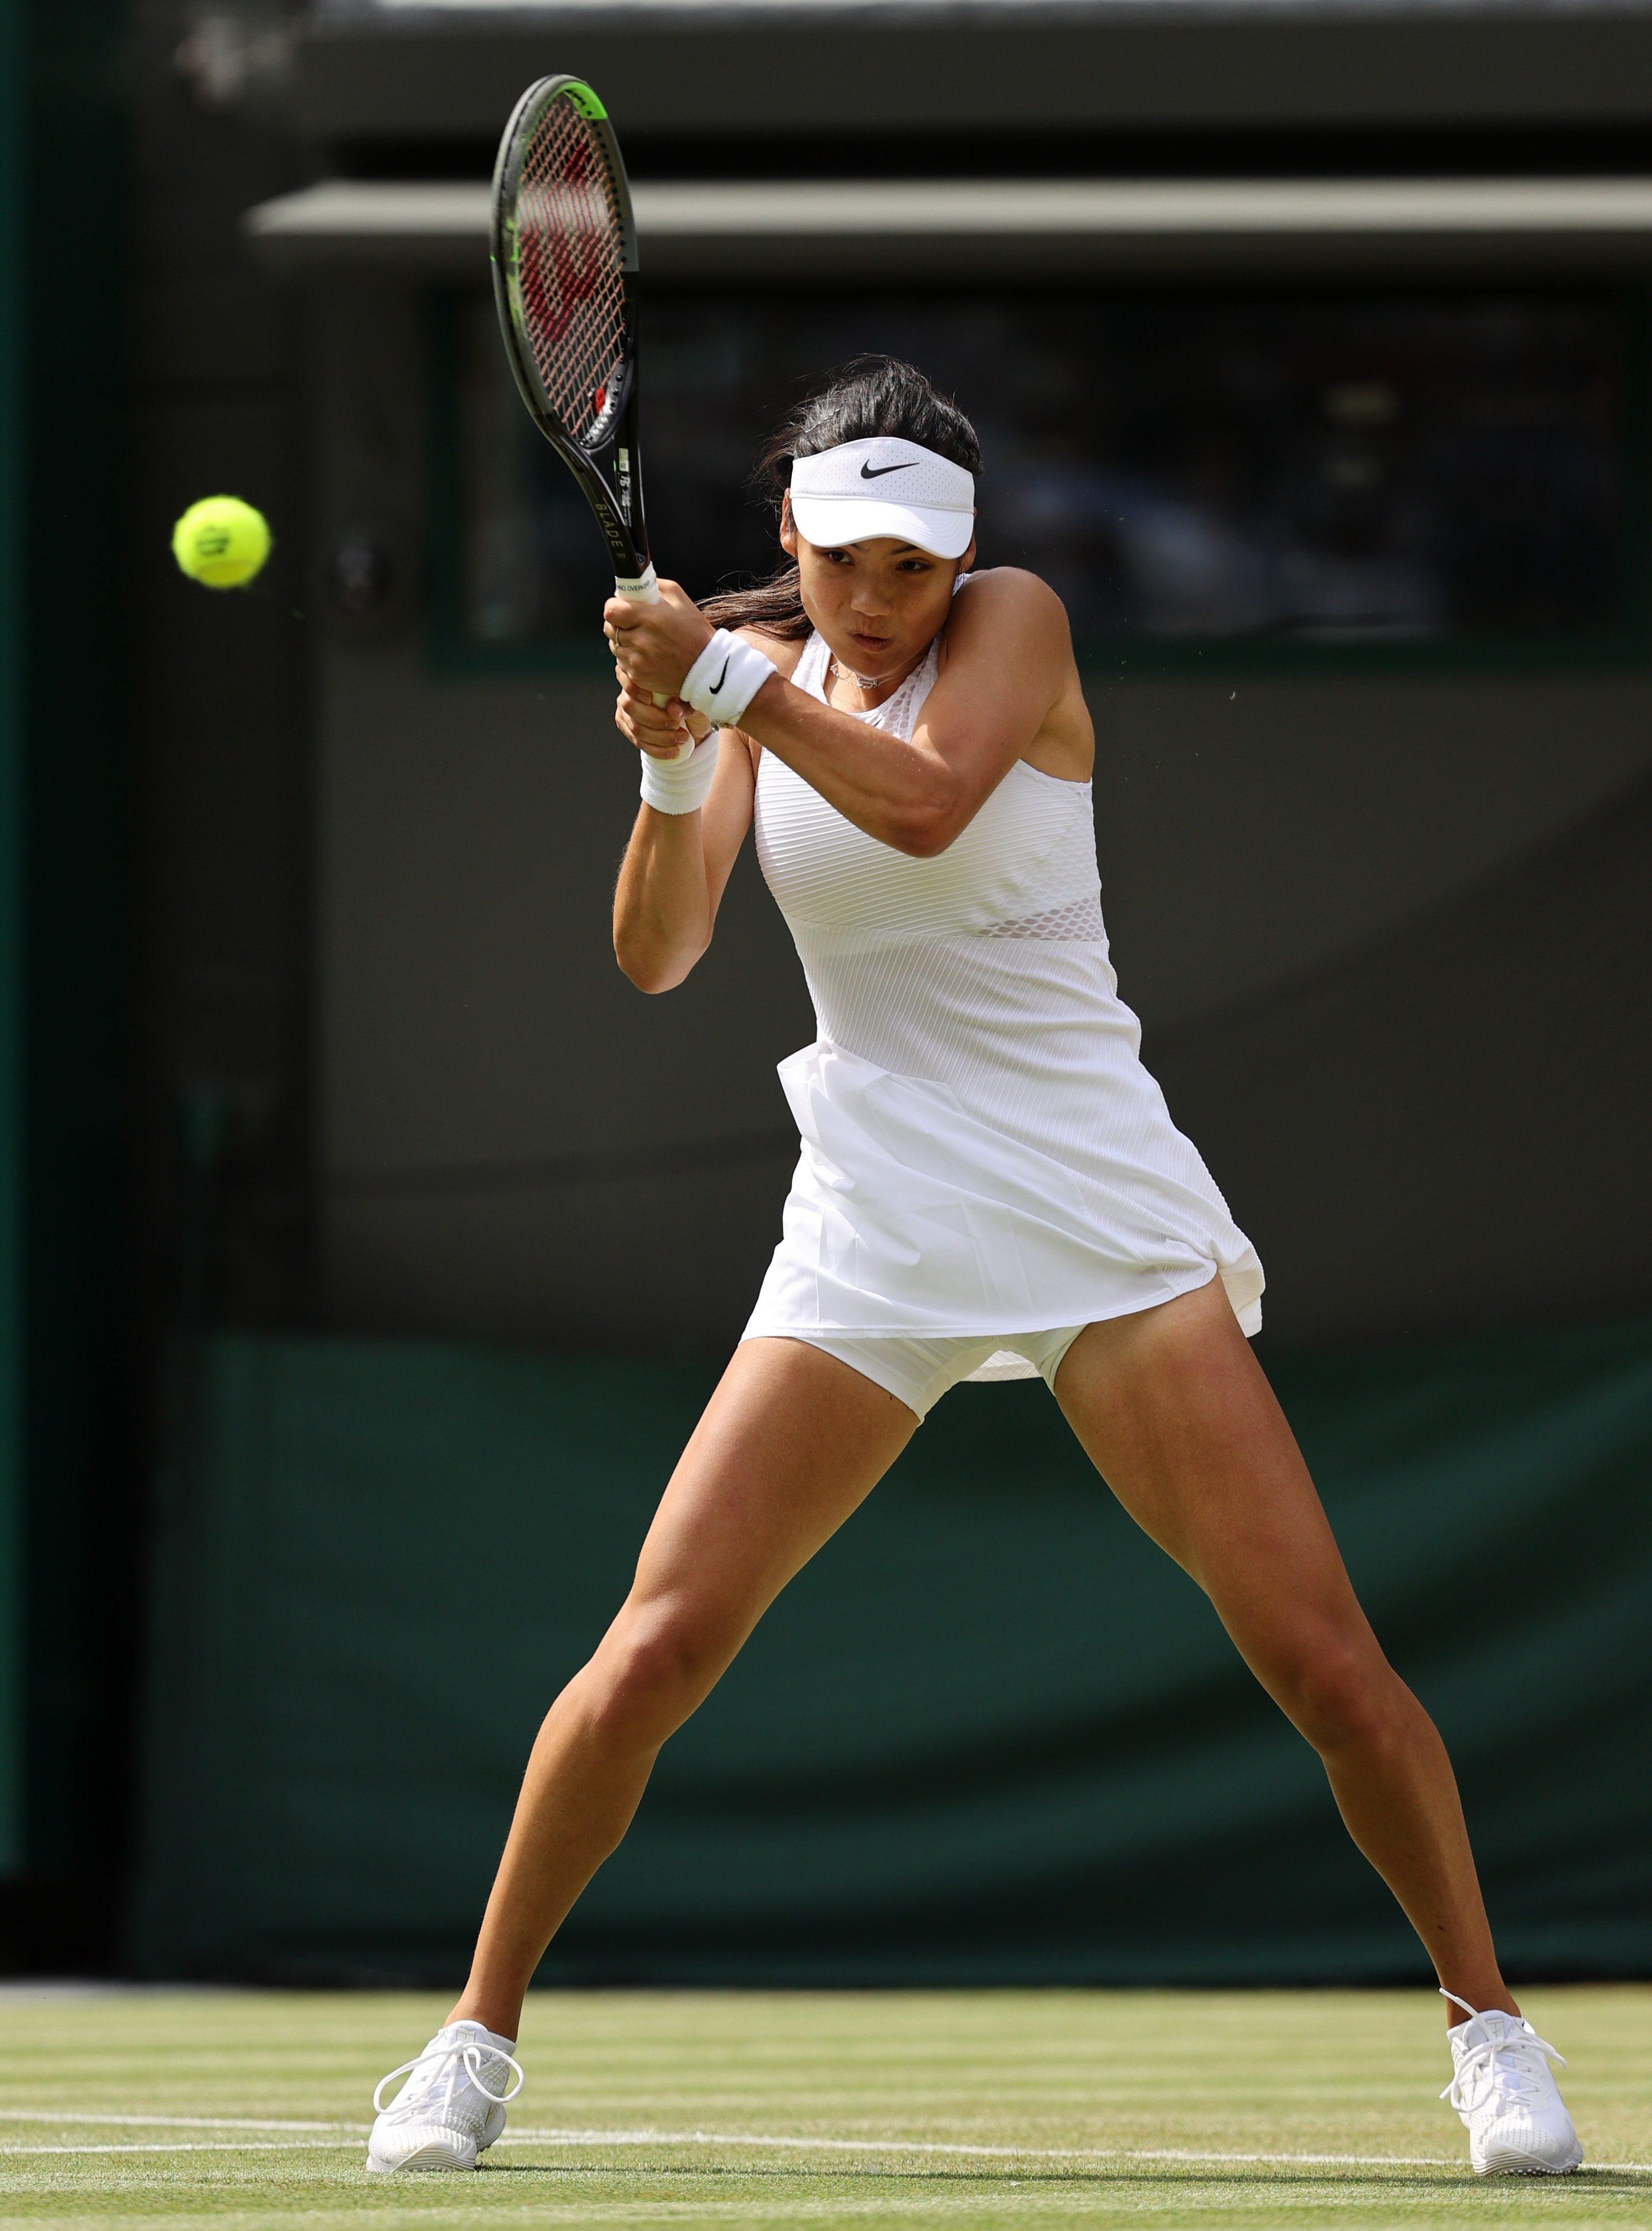 Raducanu was superb at Wimbledon earlier this year